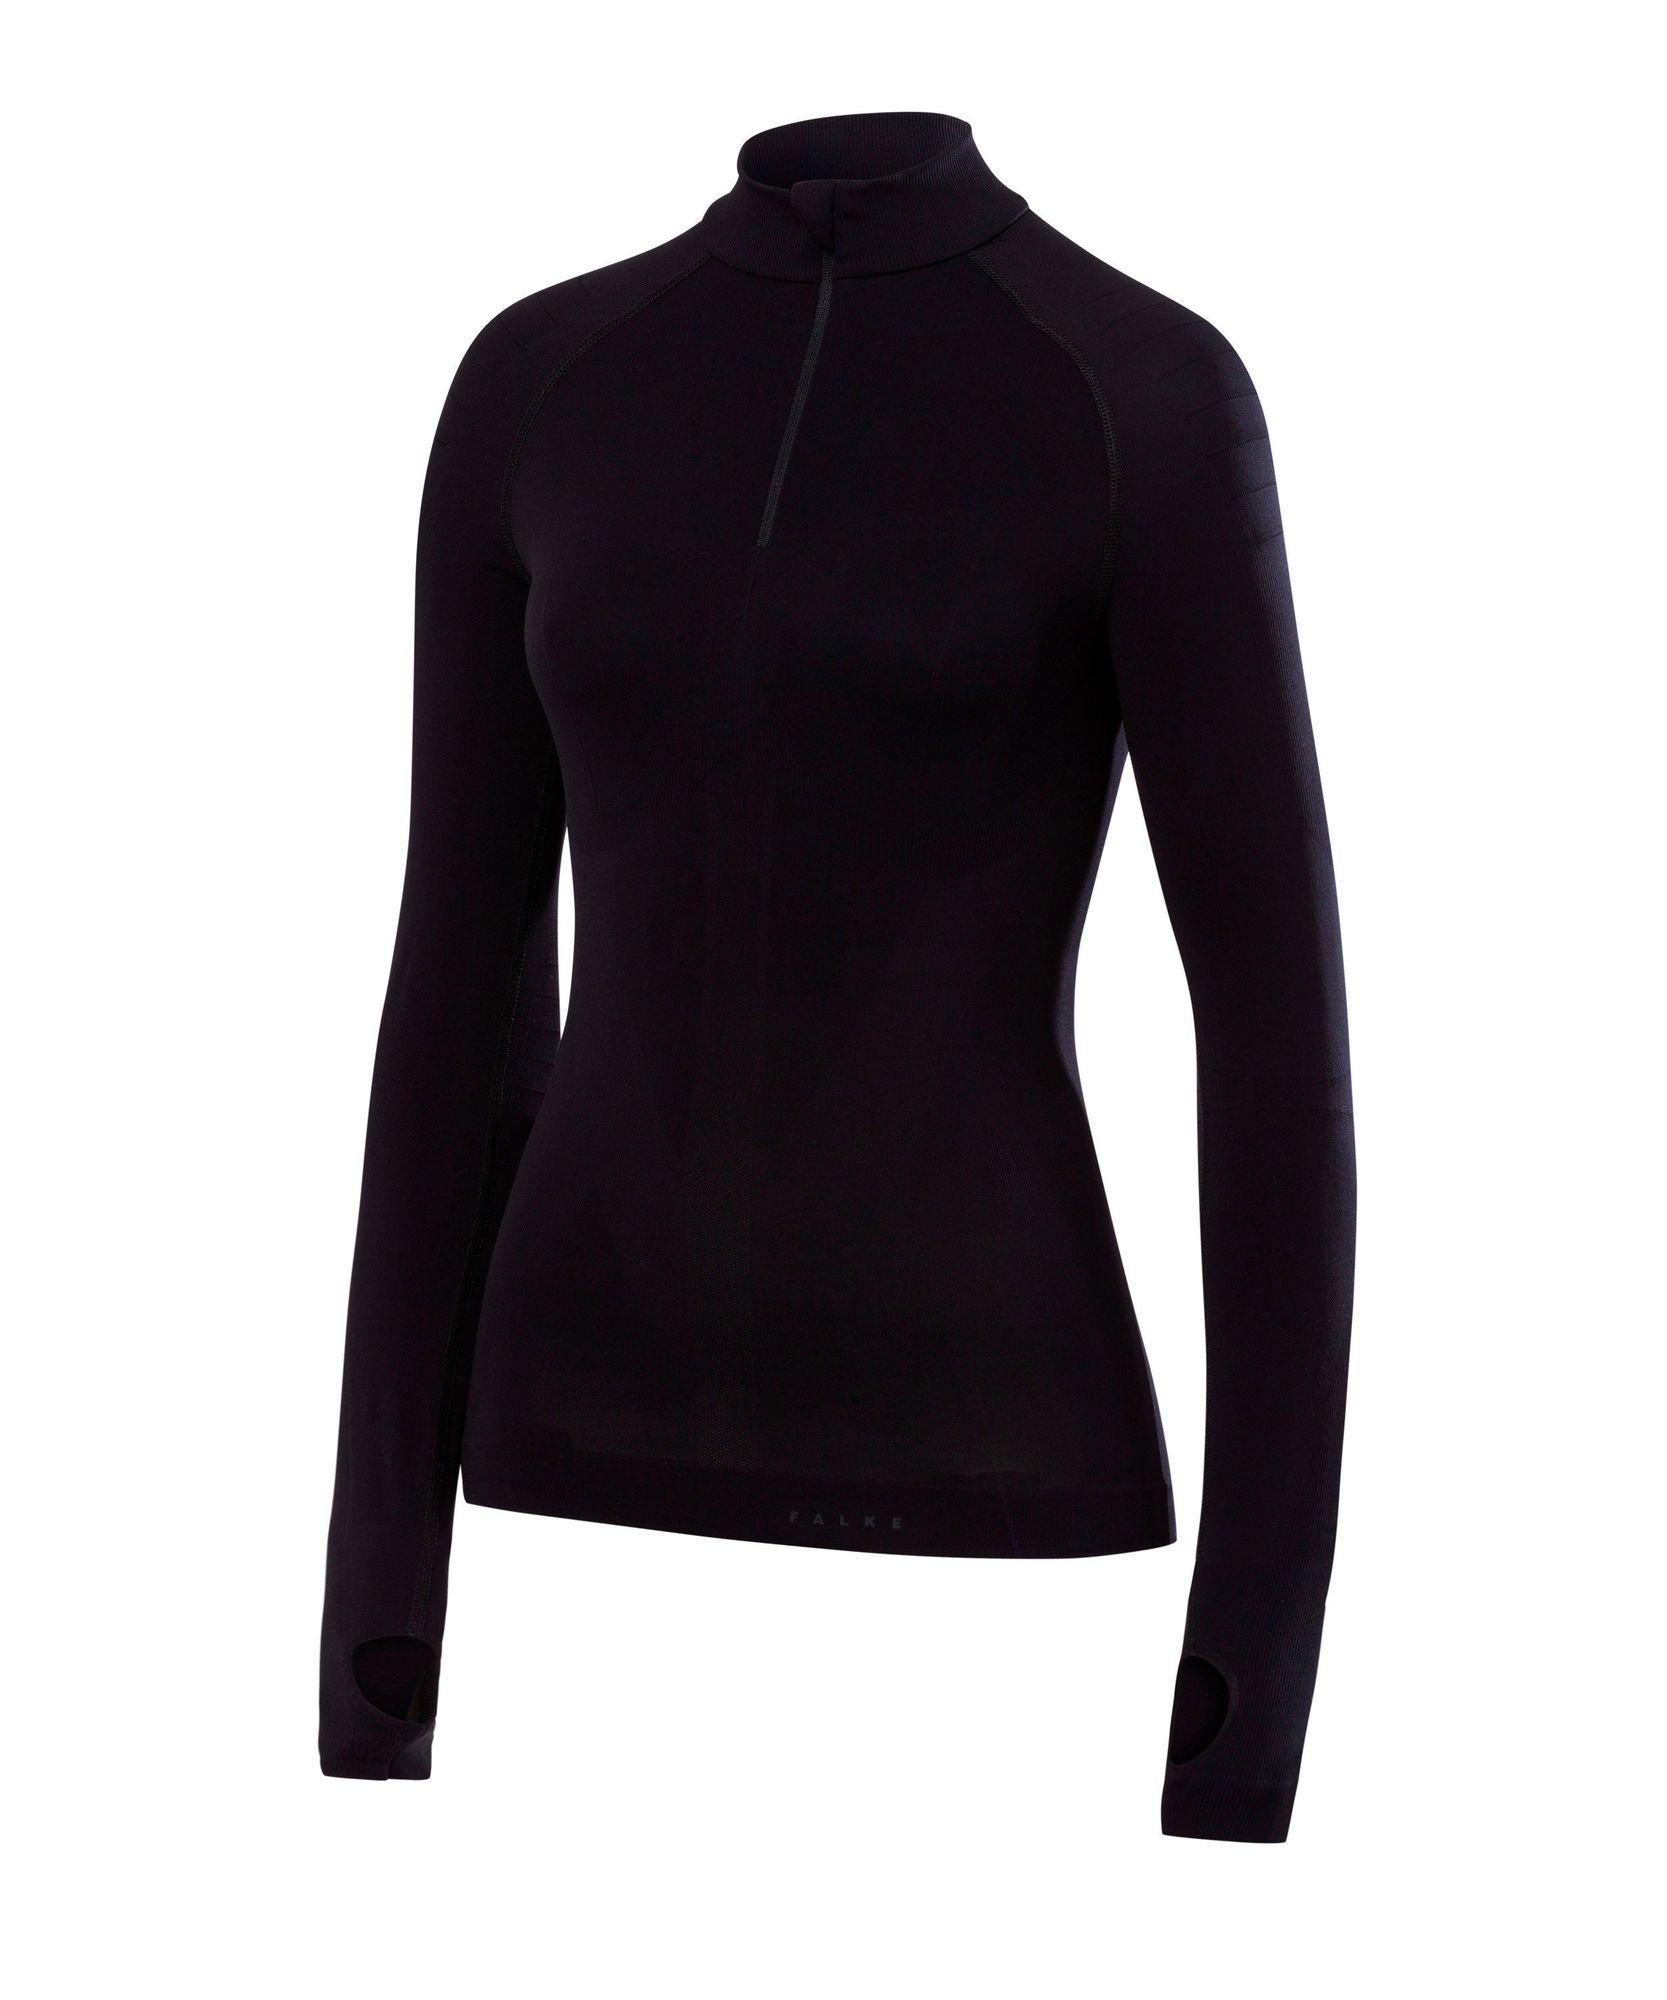 Falke Damen Langarmshirt warm in Schwarz